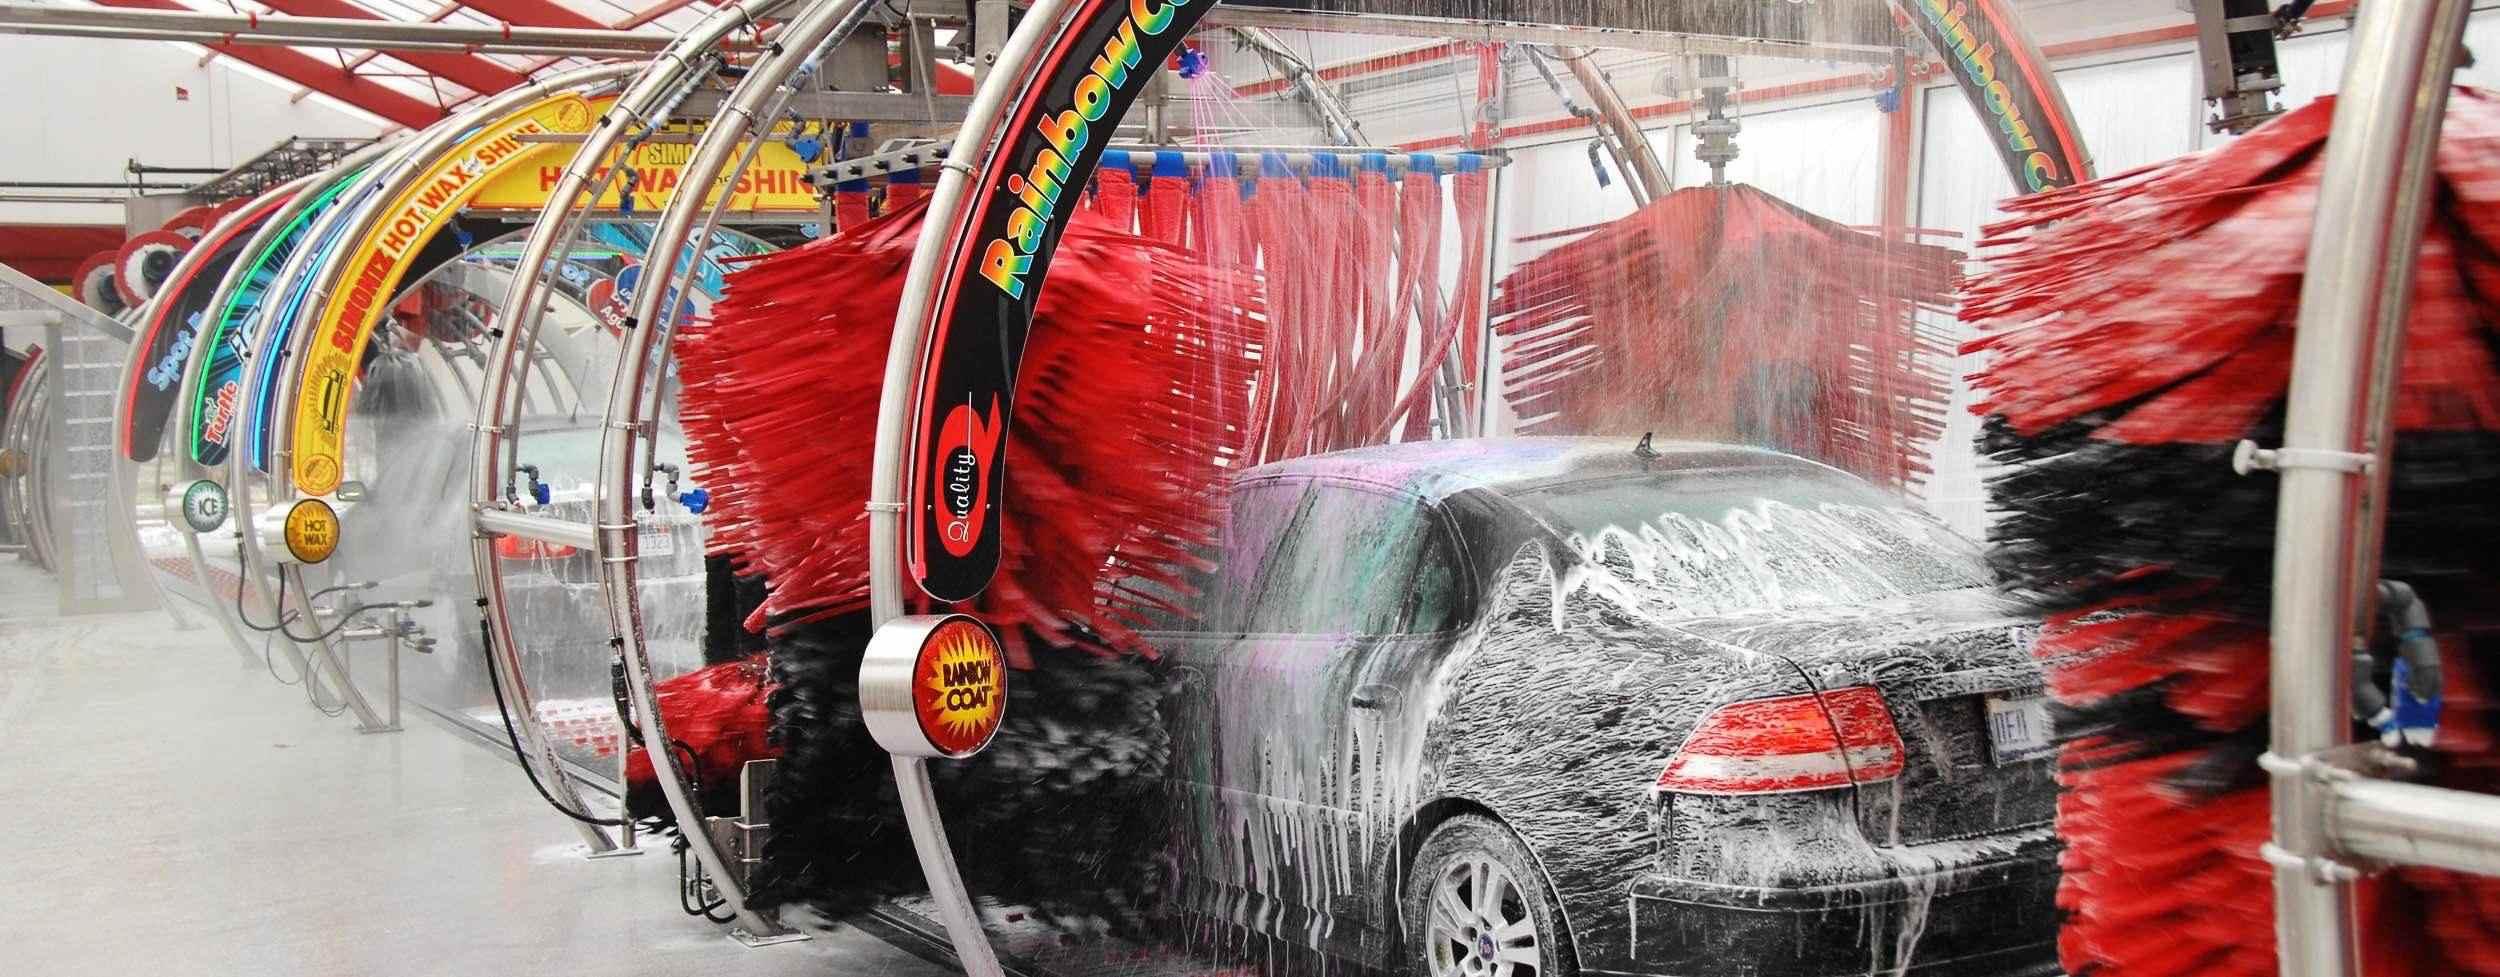 Tommy Car Wash Systems